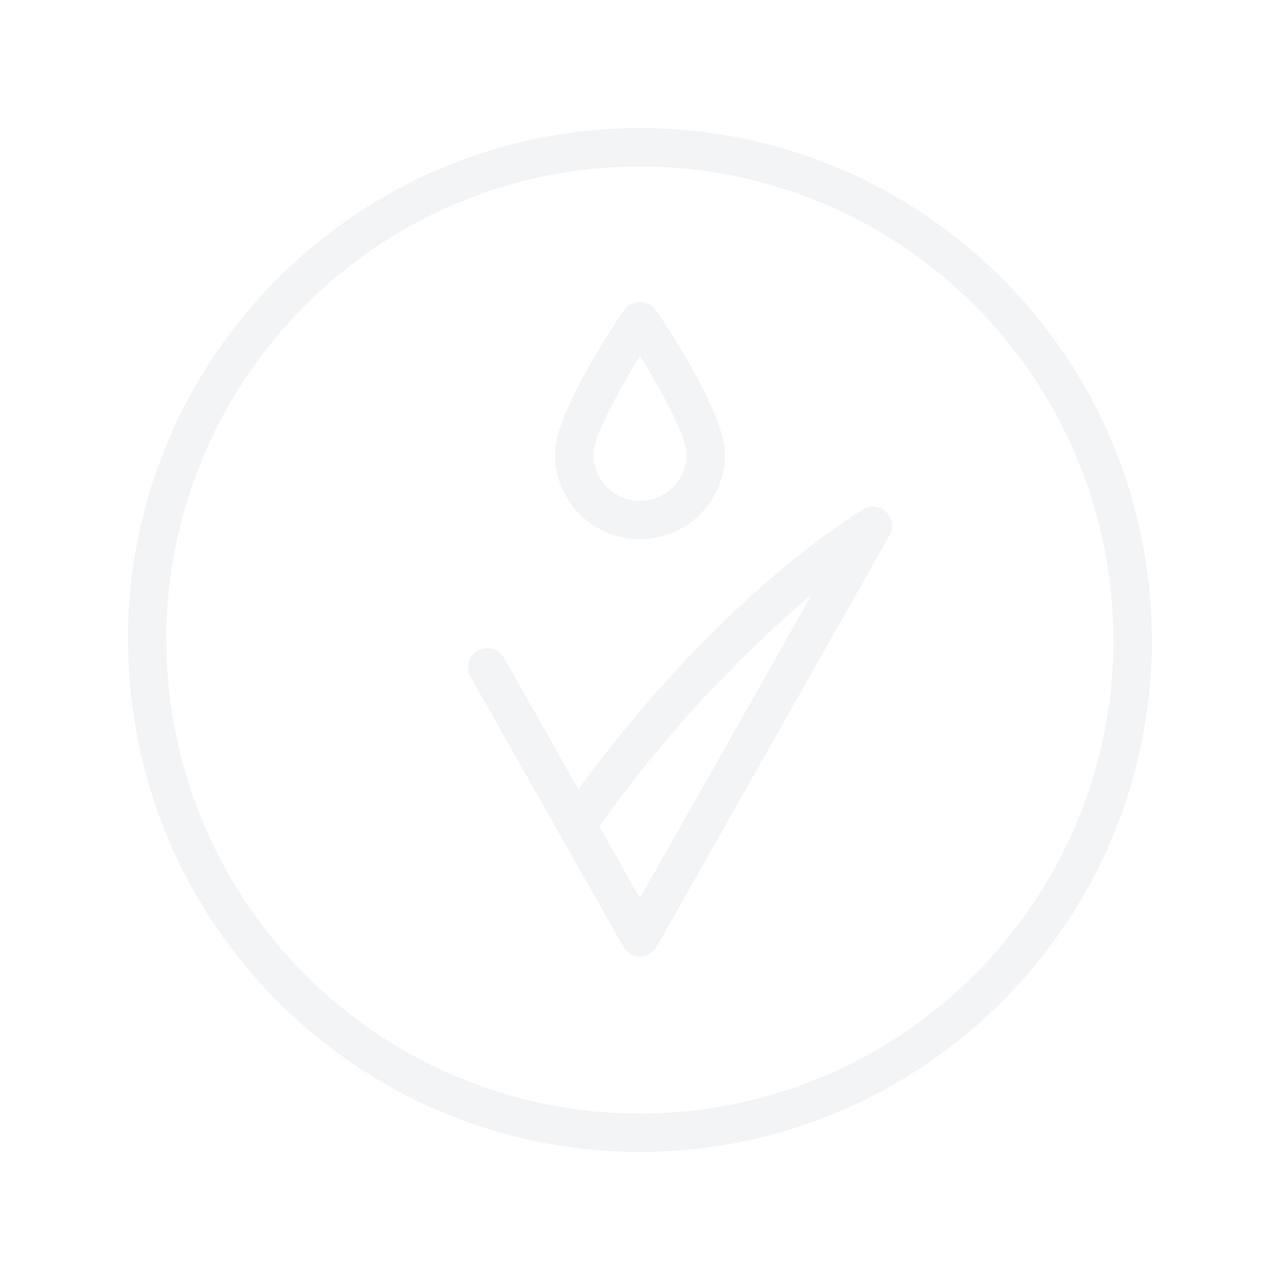 MIZON Joyful Time Essence Vitamin Mask 23g